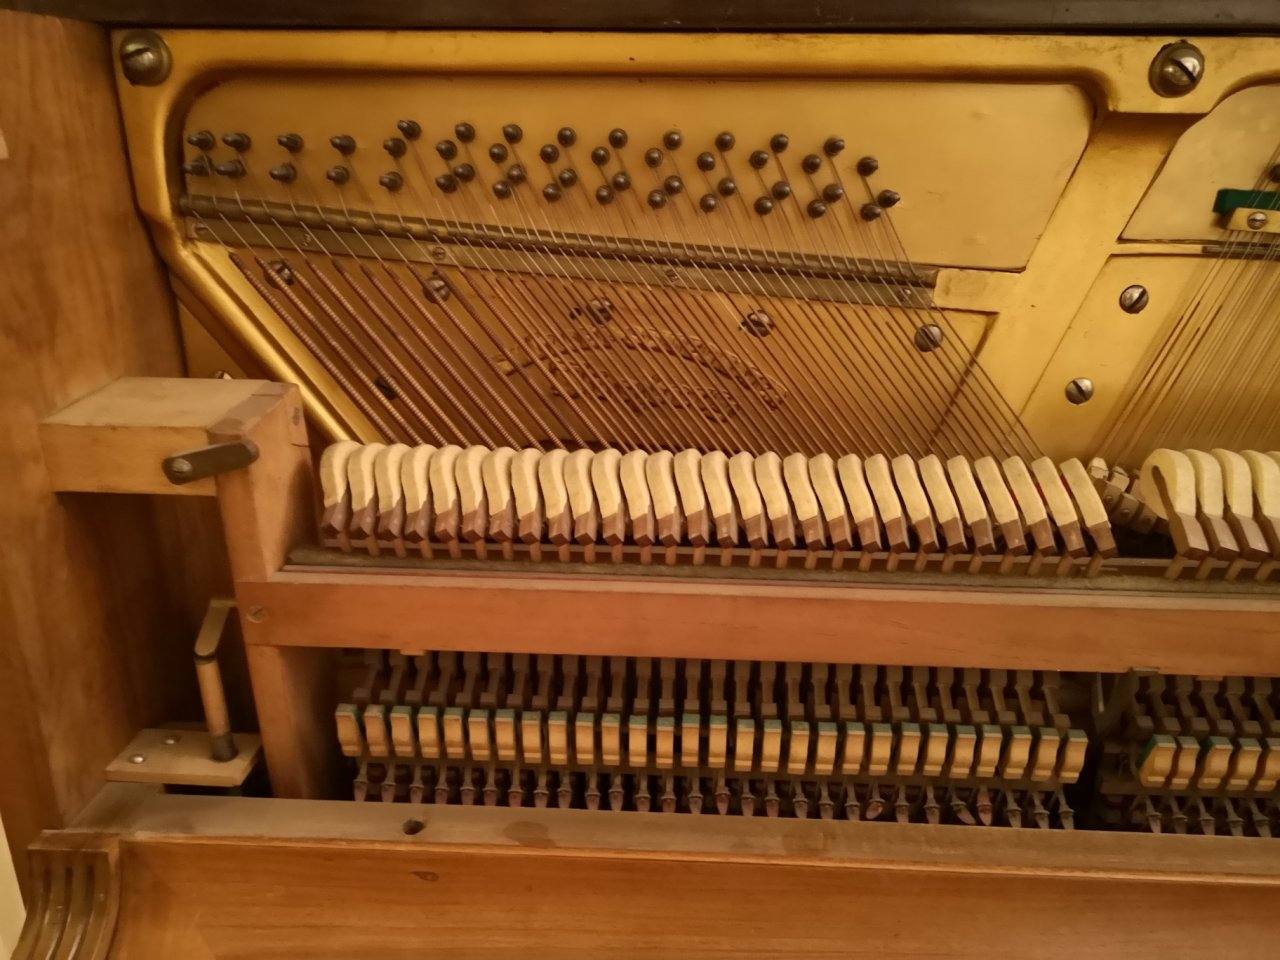 klavier02.jpg